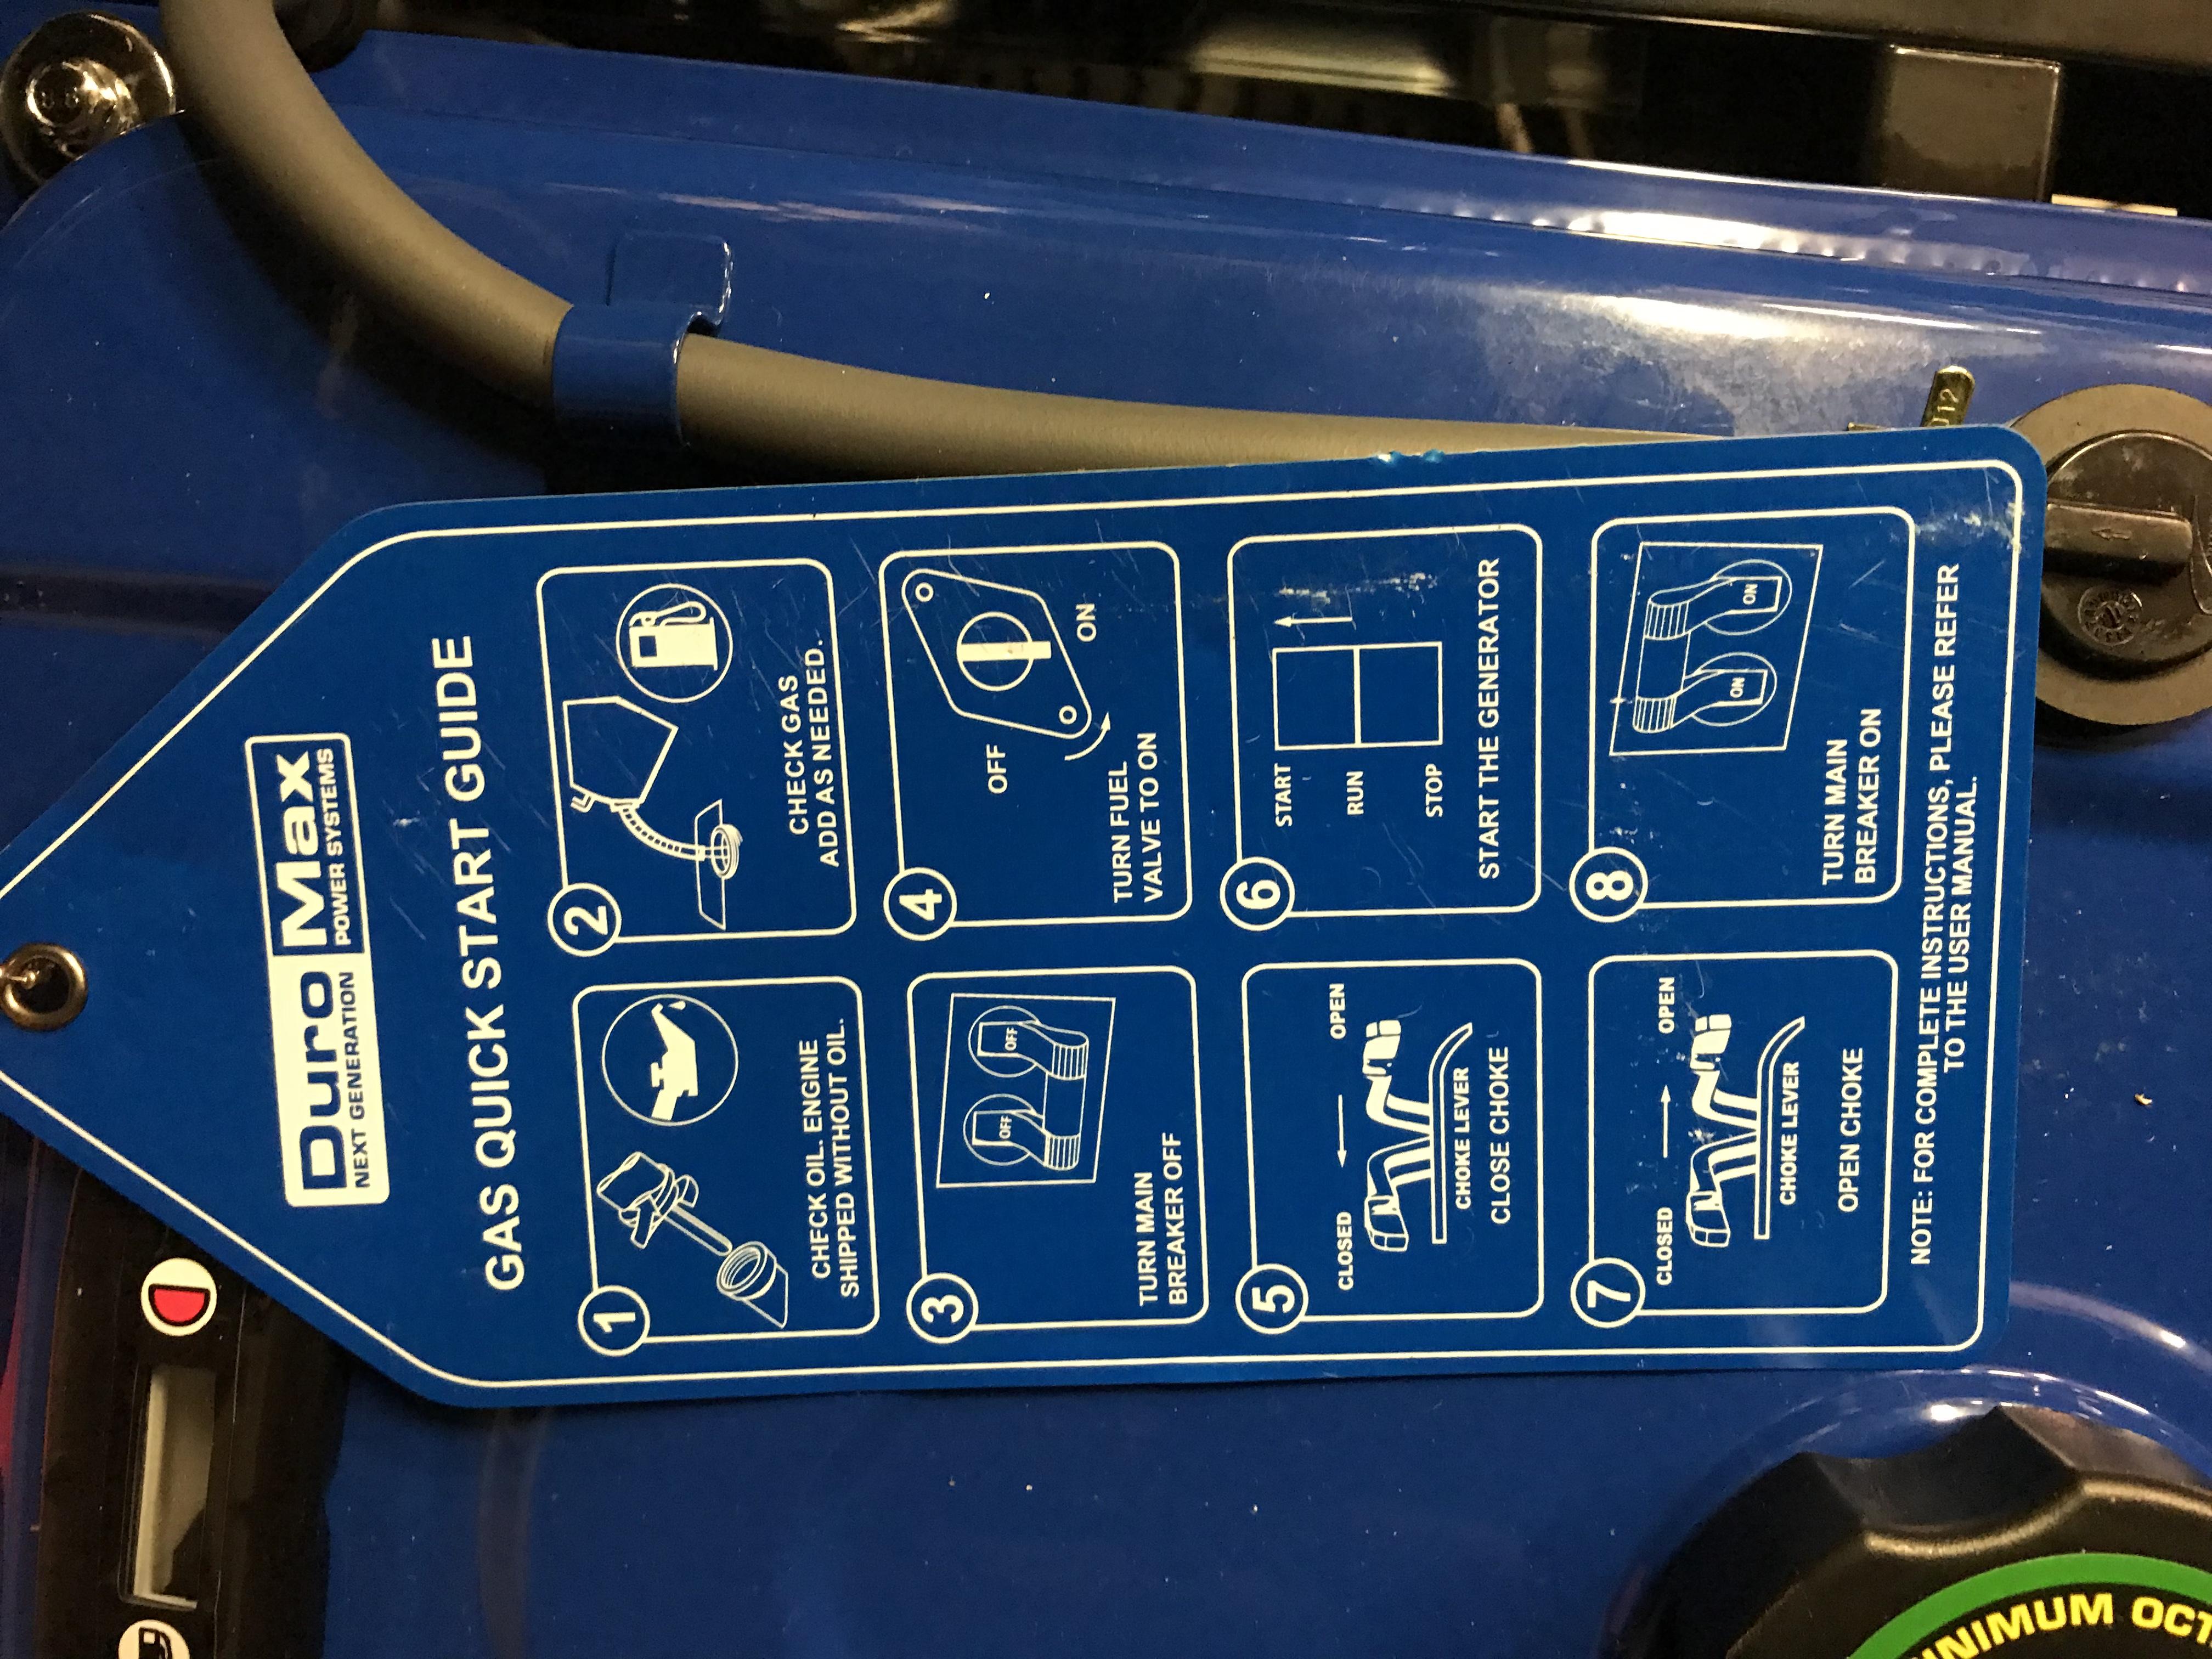 Generator help-6e9c4094-1ece-4cc6-a261-802e6acc1e94.jpeg